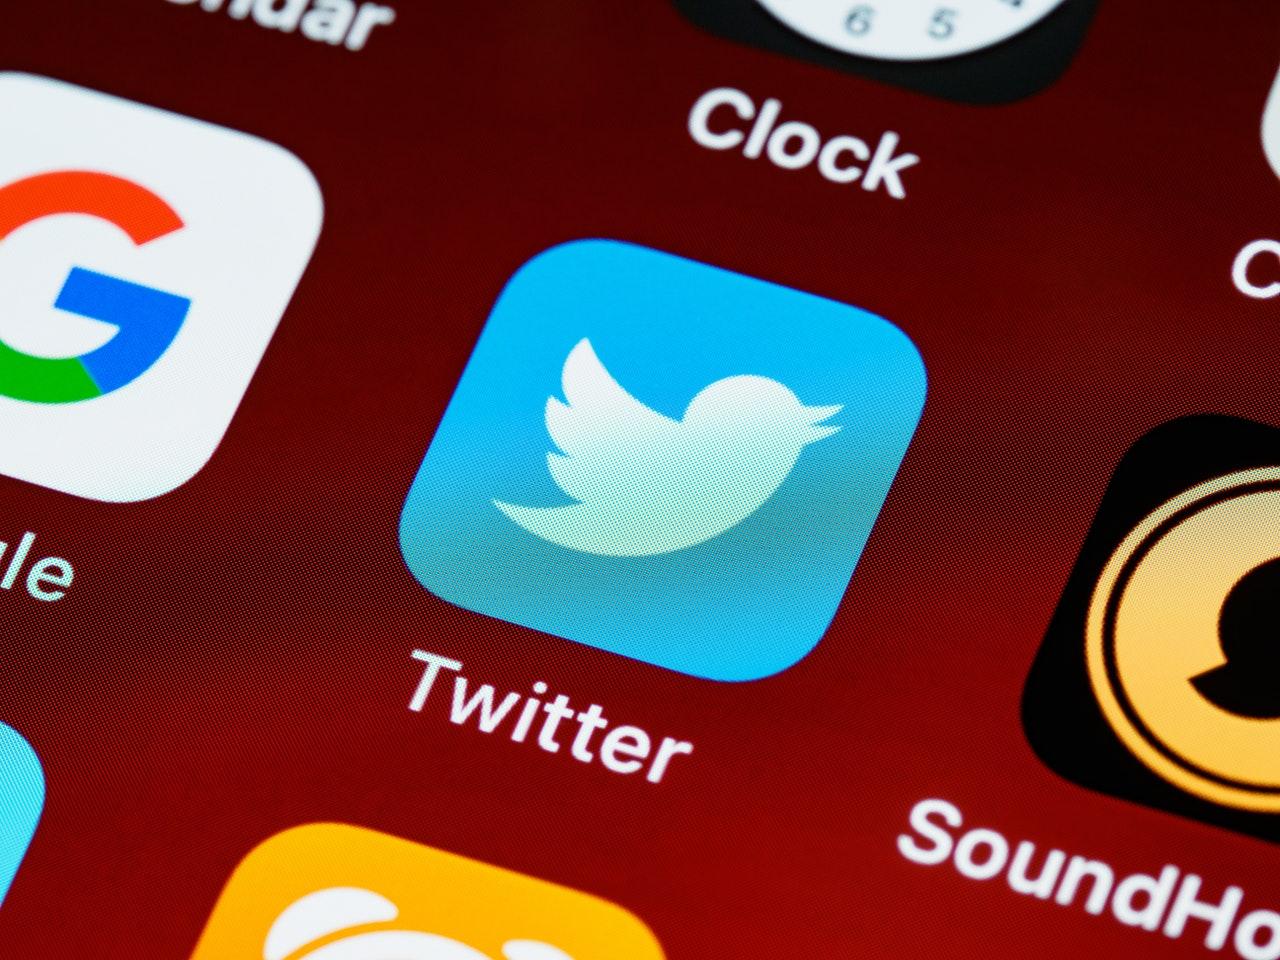 Twitter Data Reveals Consumers' Priorities For Summer 2021